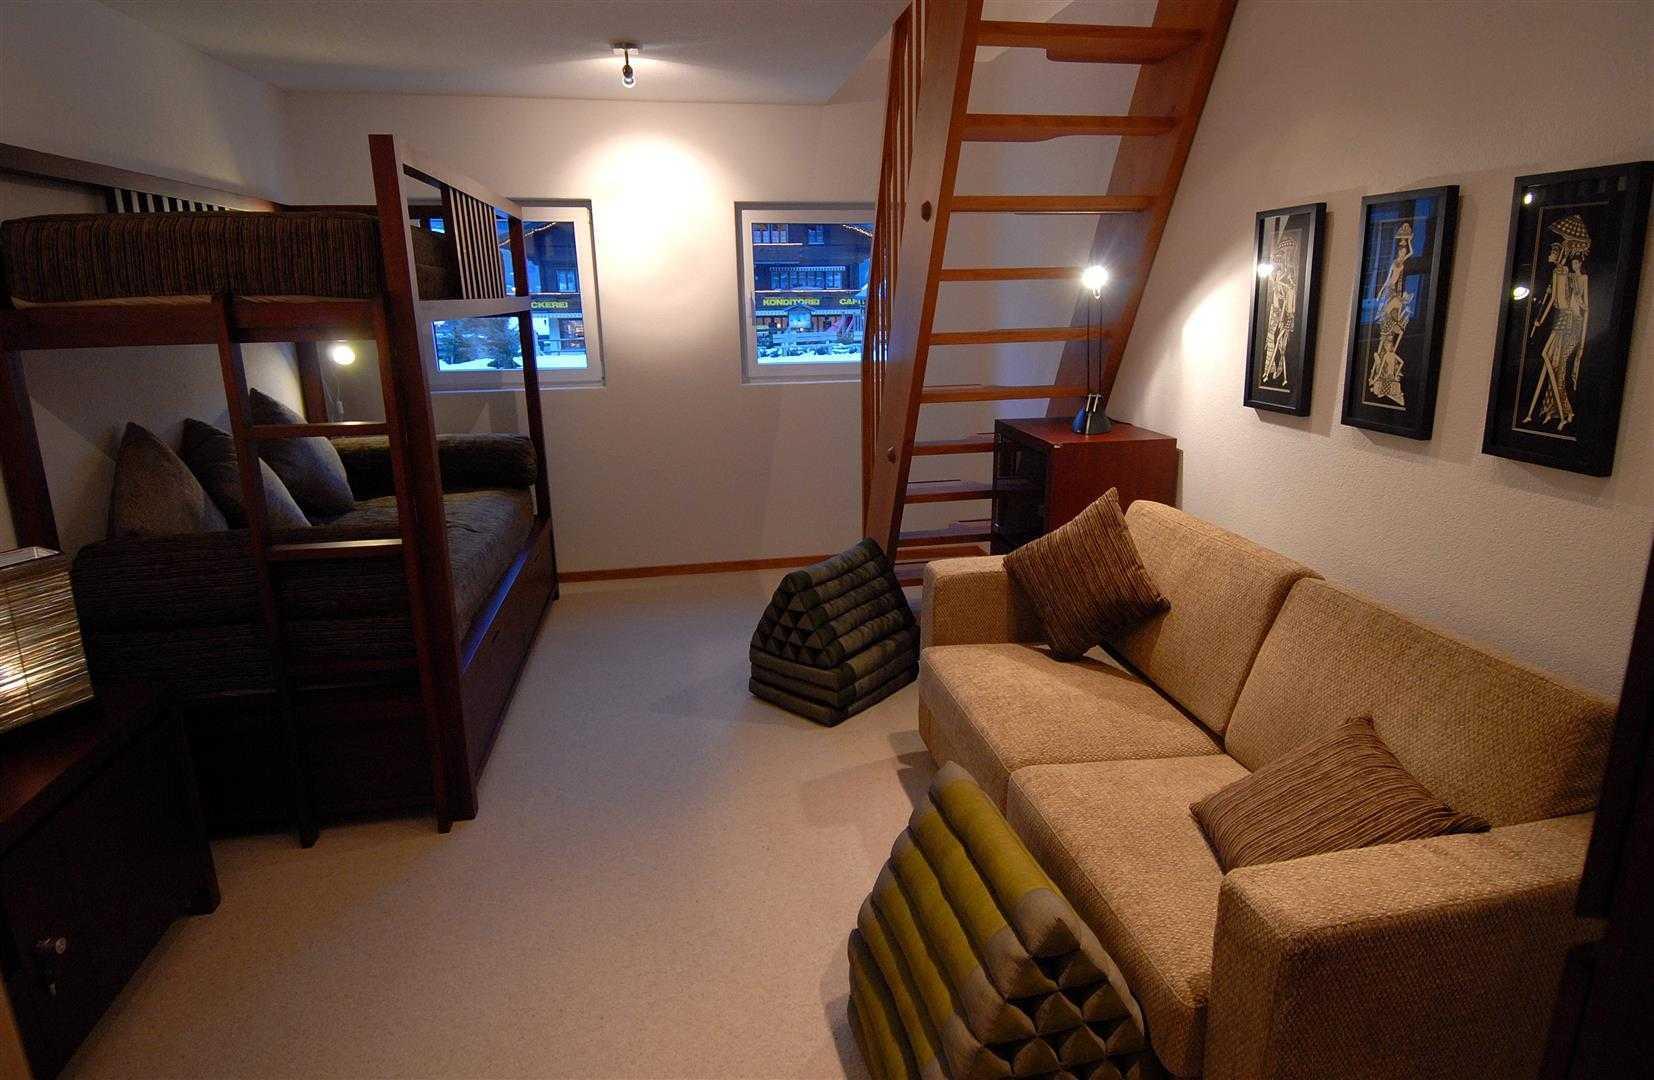 Agung Budi Raharsa Lenk Hotel - Switzerland Switzerland Switzerland Bedroom-7 Minimalis  12774